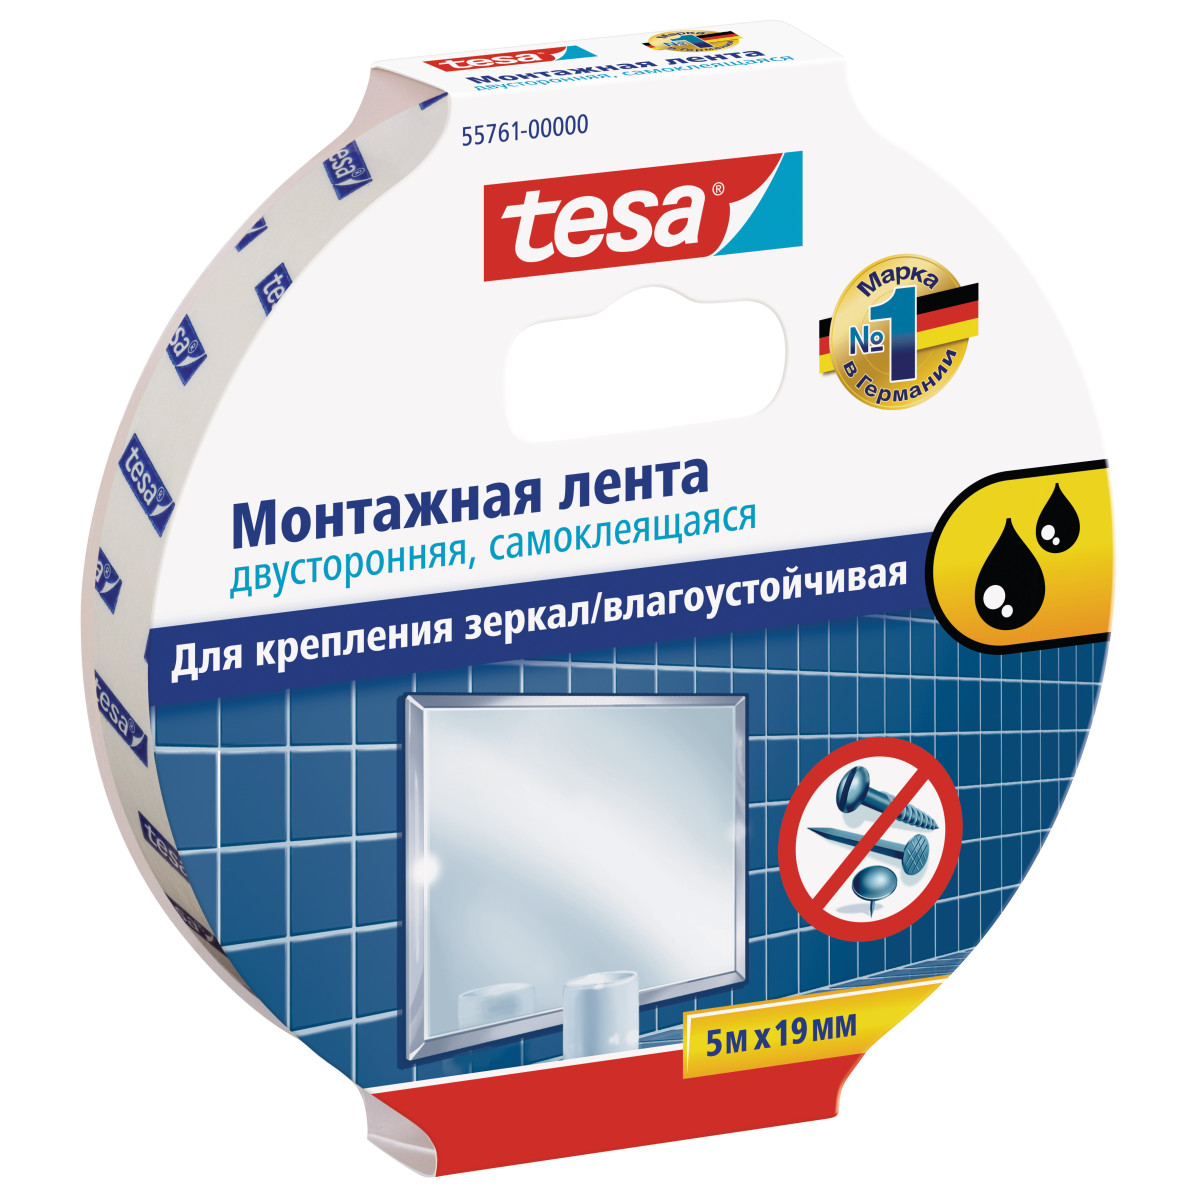 Лента клейкая двусторонняя для крепления зеркал Tesa Powerbond 19 мм x 5 м цвет белый